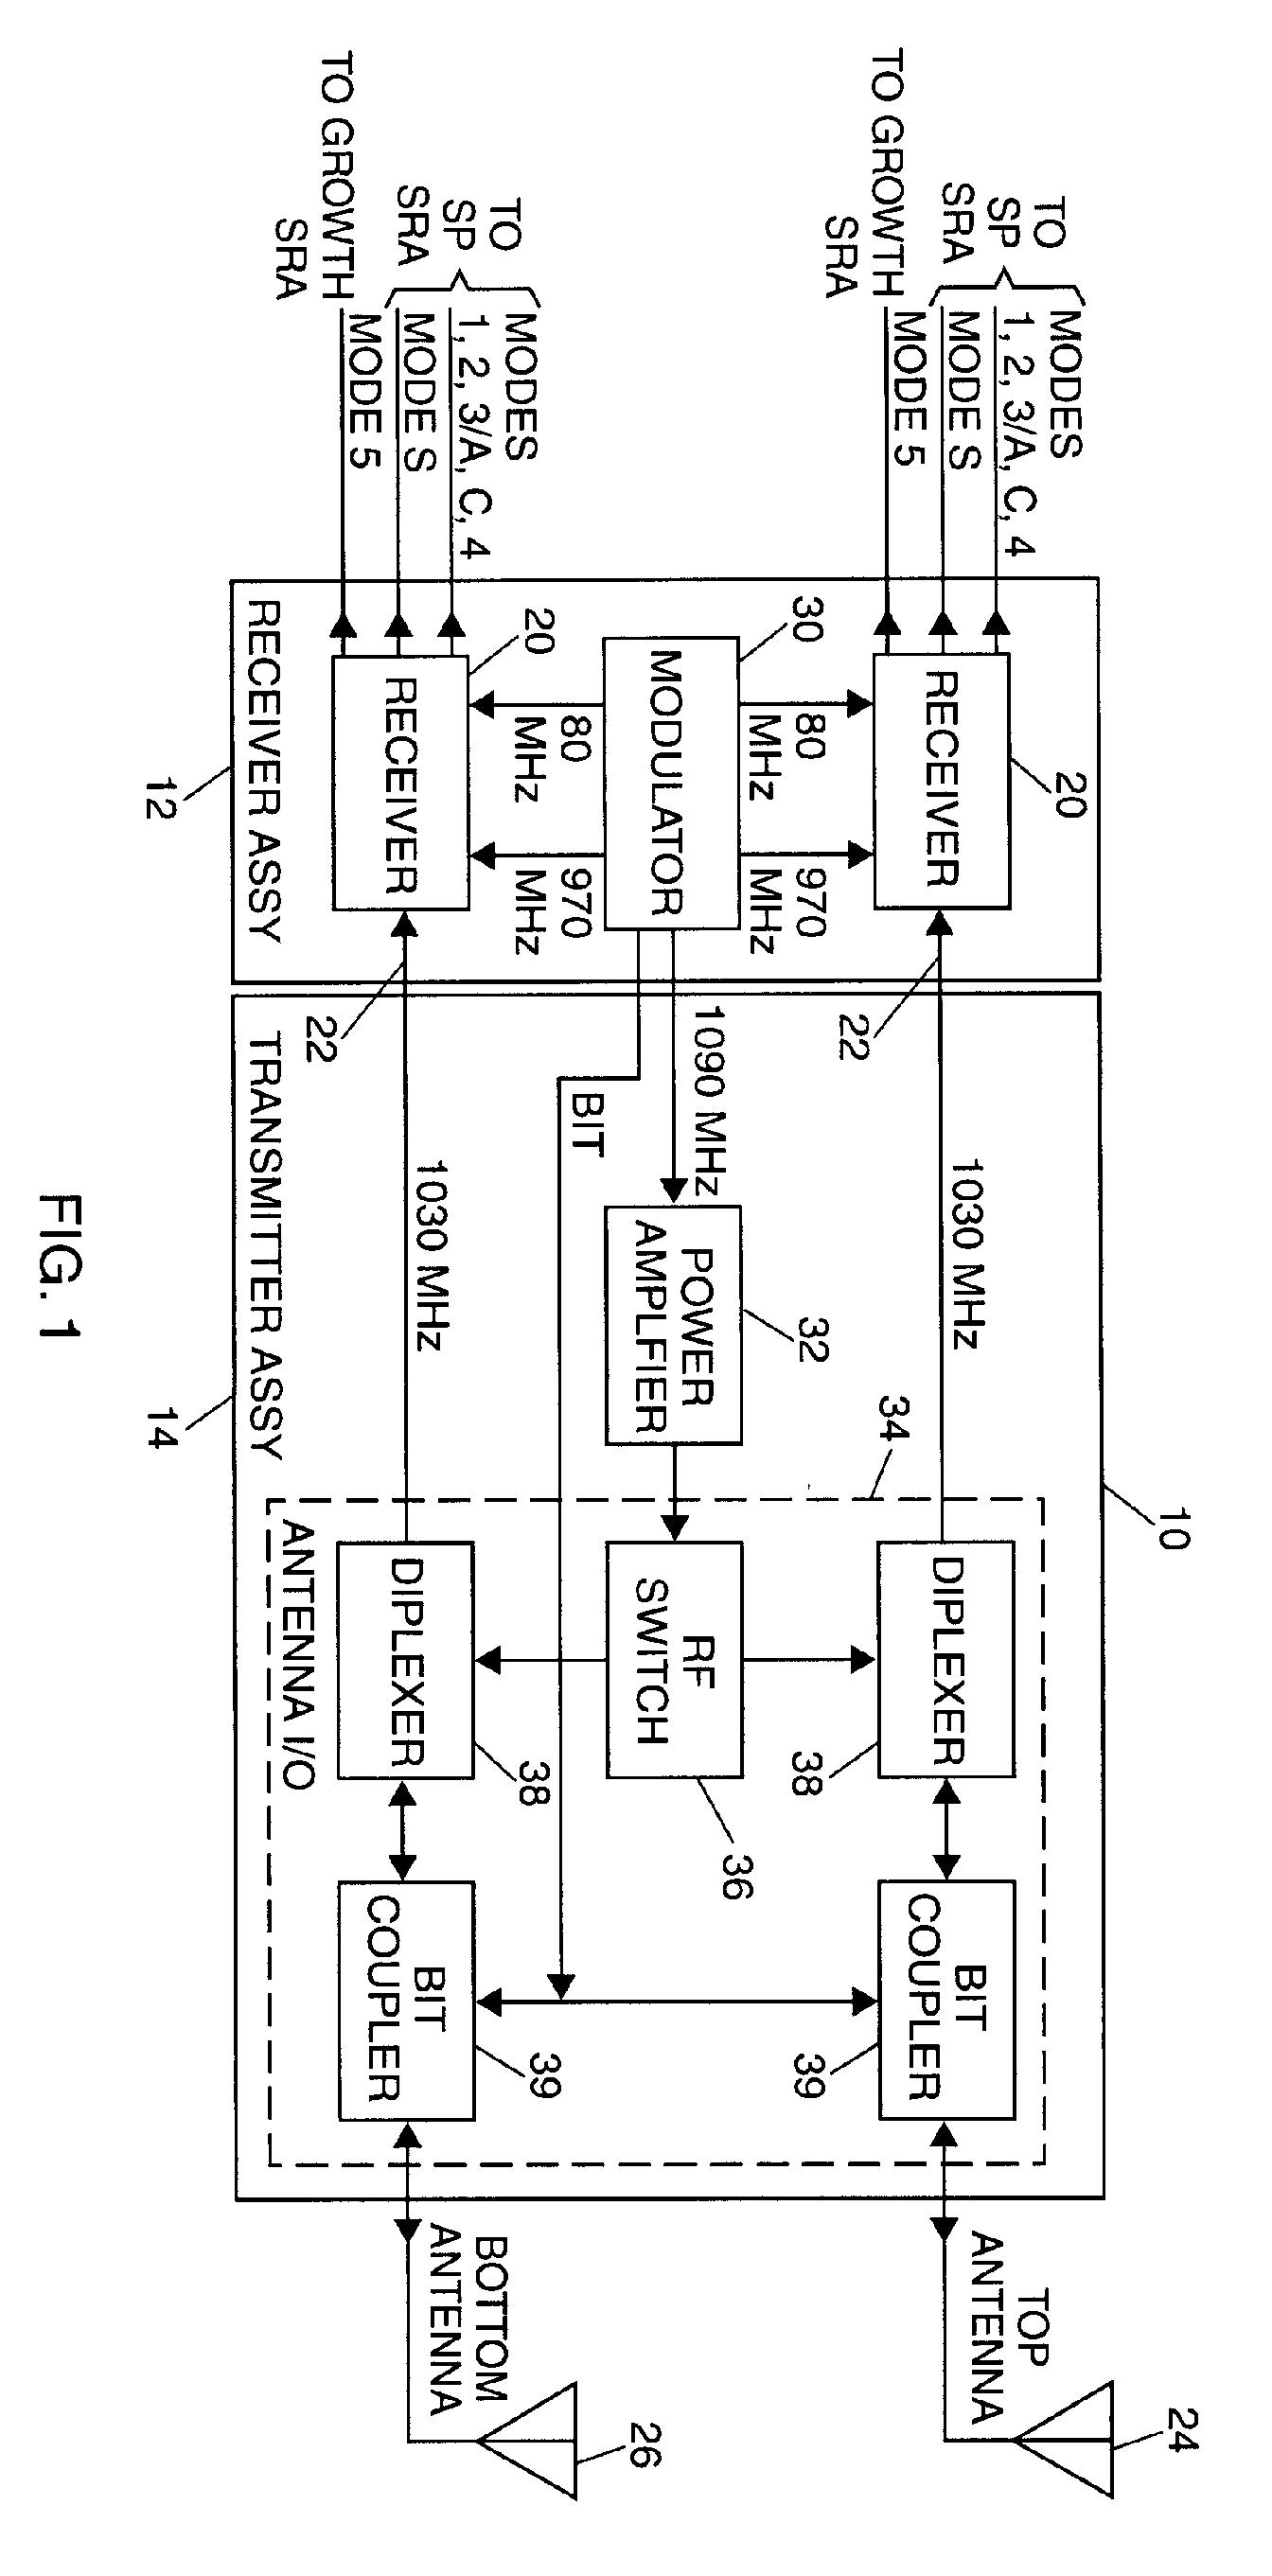 patent ep1189073a2 multi mode transponder receiver architecture  mode s transponder block diagram #25